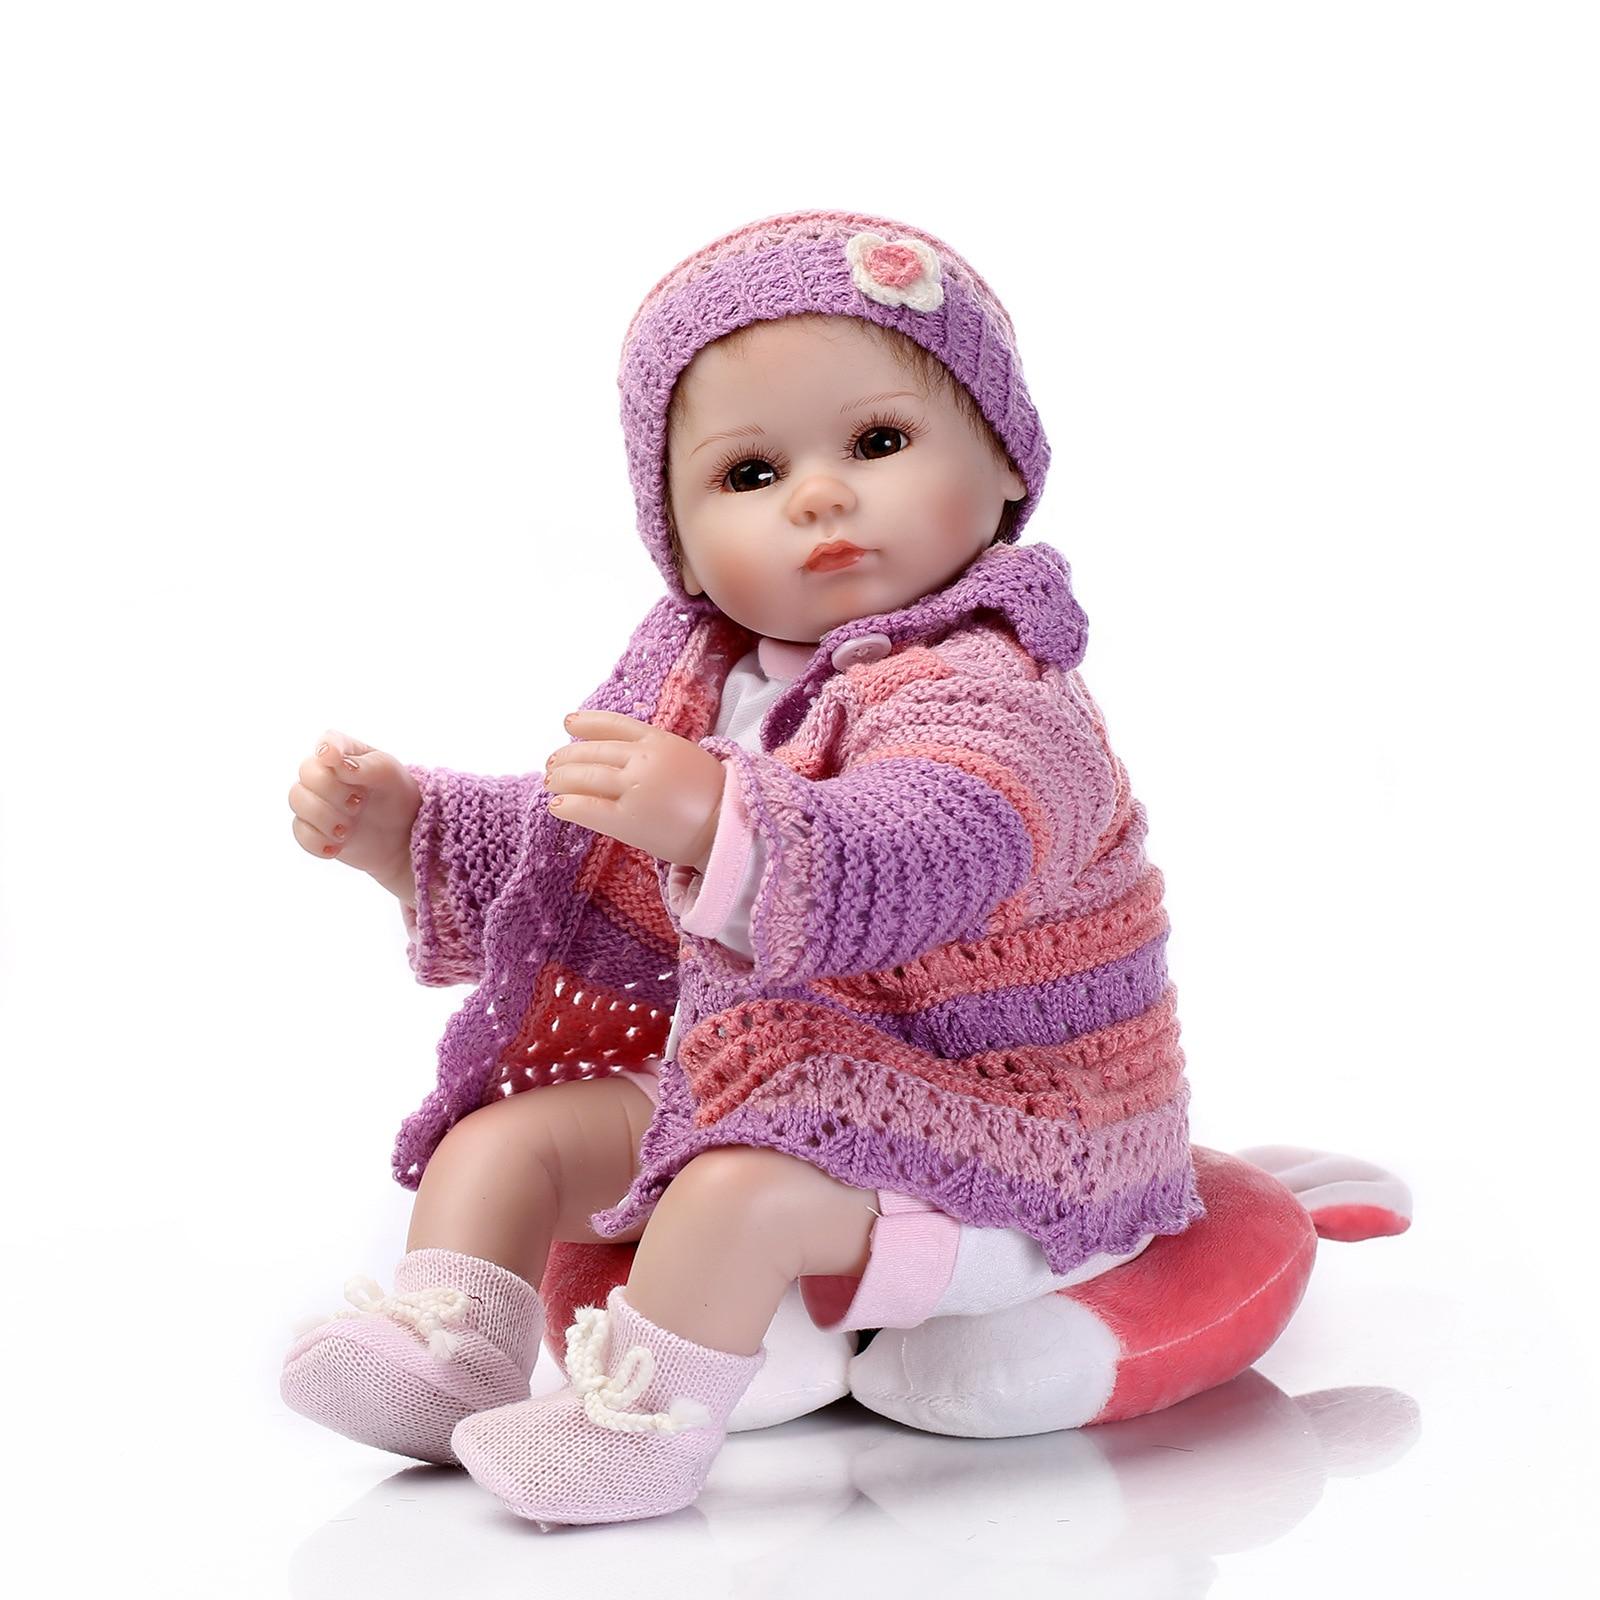 NPK Model Reborn Baby Doll Soft Silcone Infant EBay Hot Selling Supply of Goods(China)